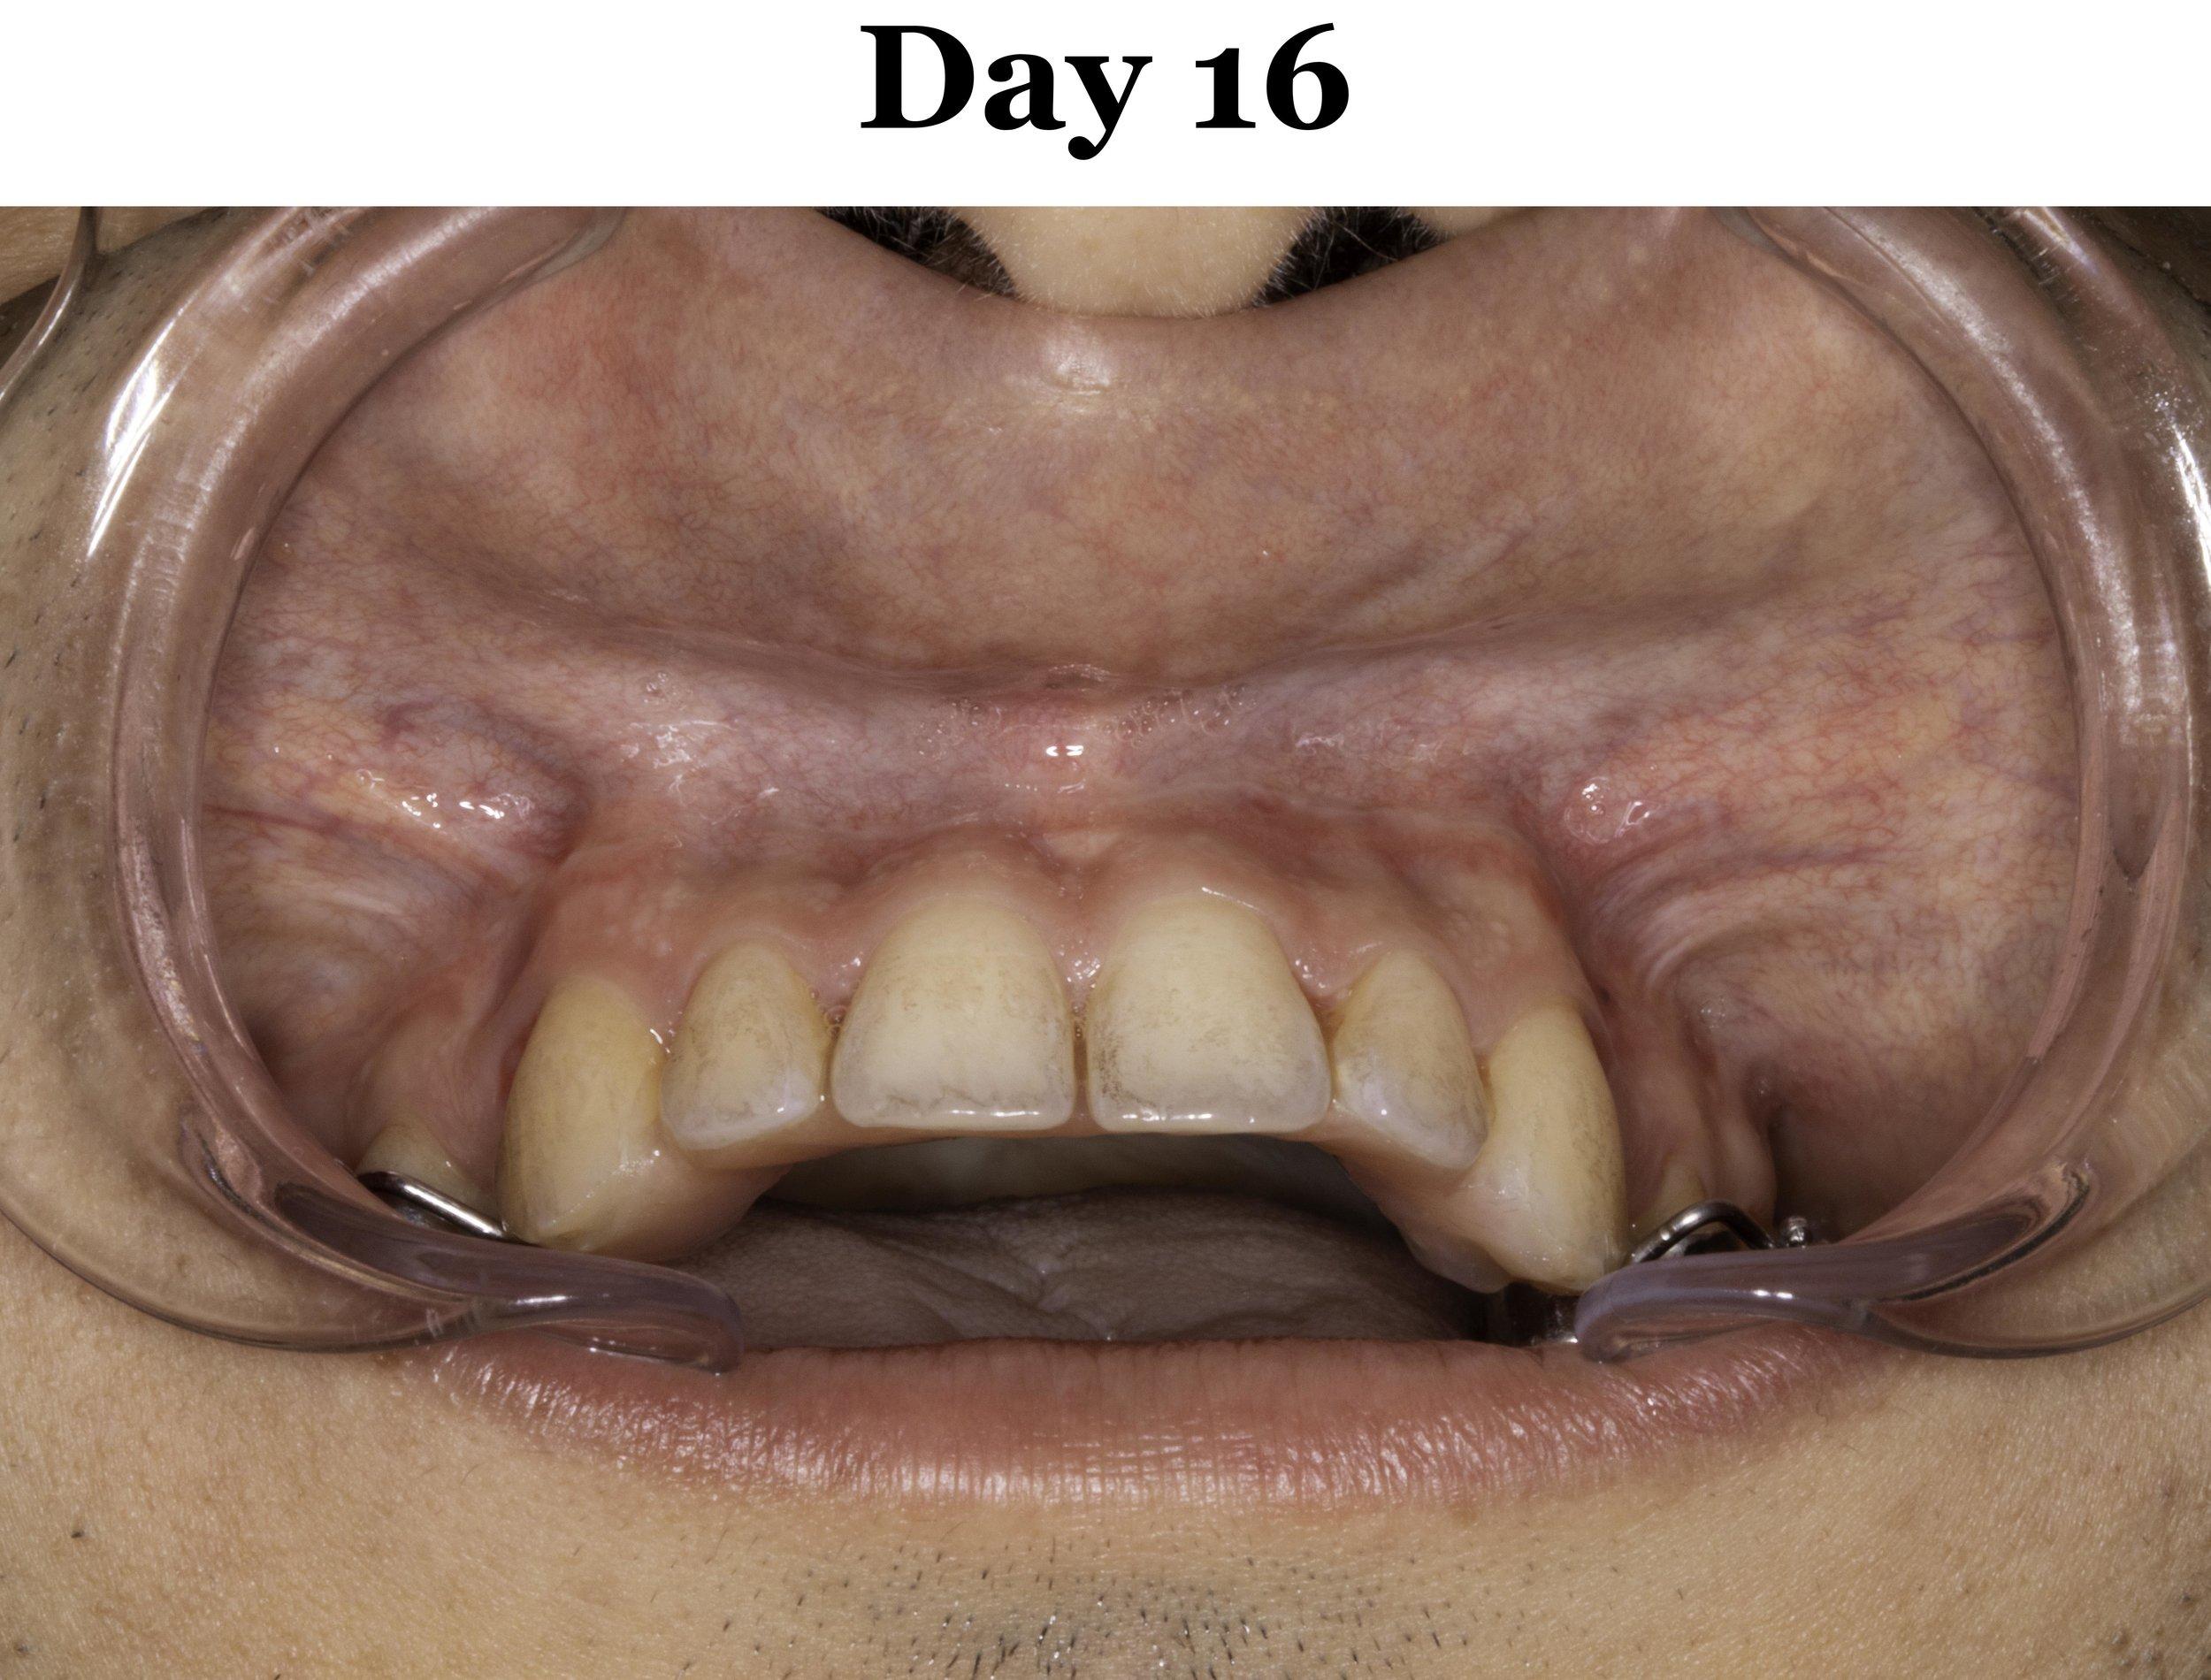 Lip Tie Release Day 16_Upper.jpg